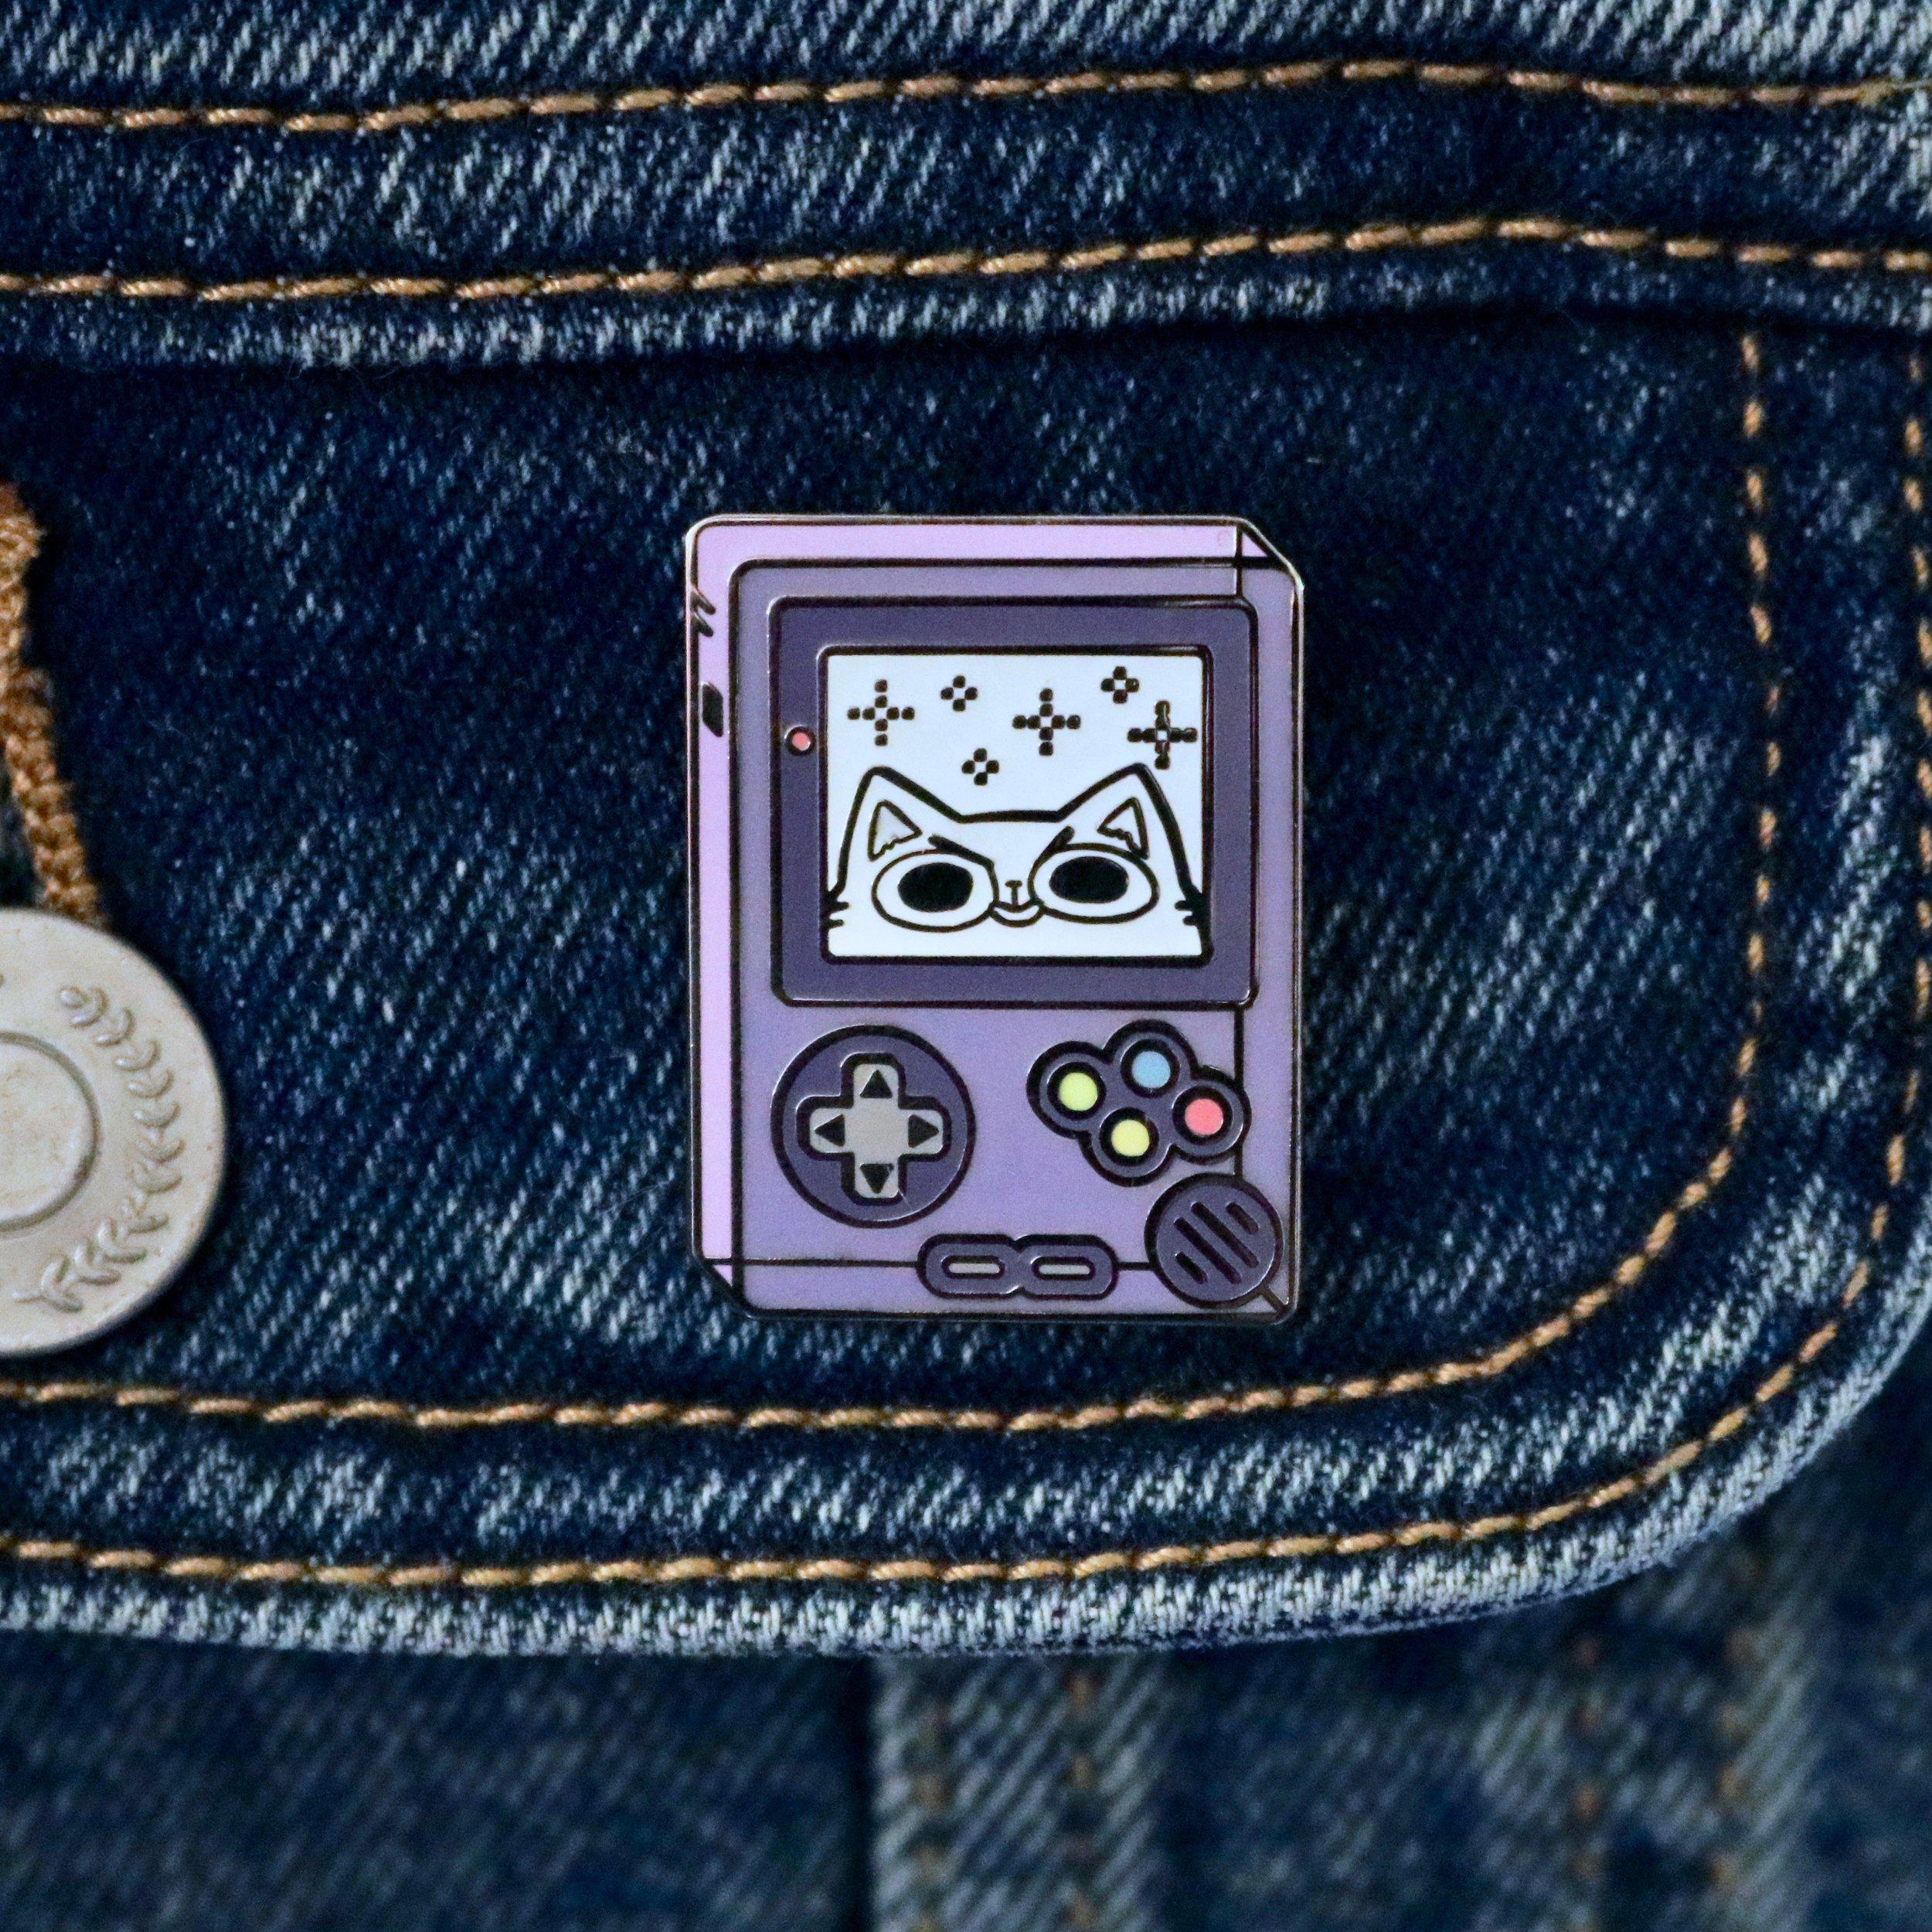 0?? - Video Game Cat (Purple), 2019